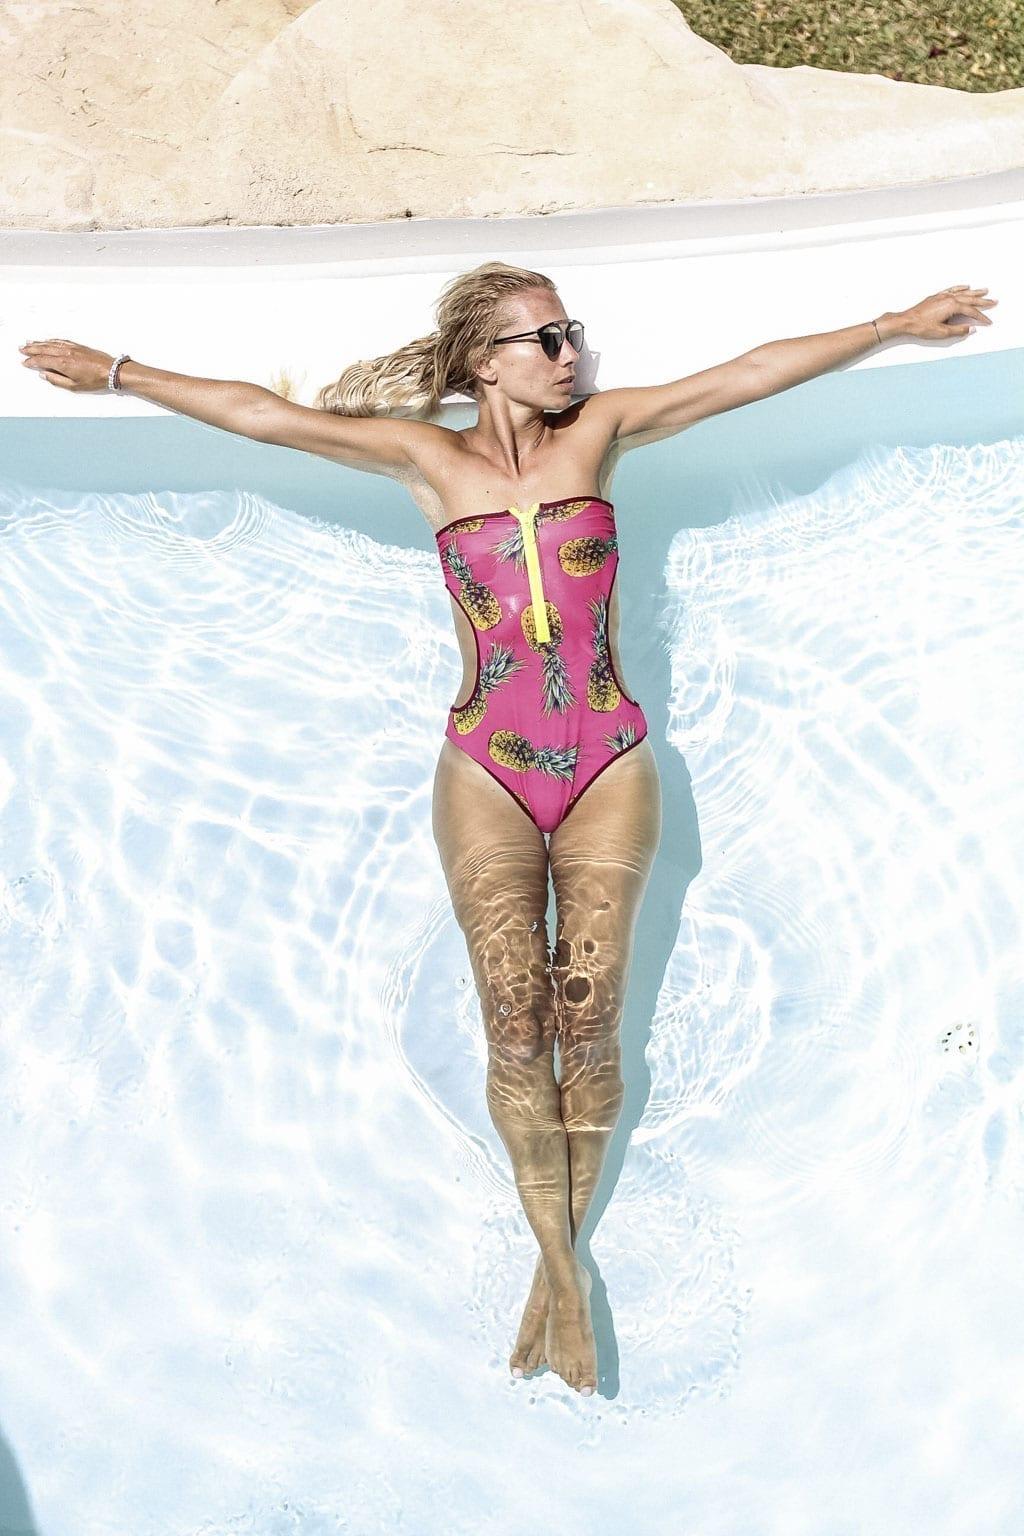 CK-1606_Sardinien-Sardegna-Sardinia-Italy-Italia-Fashion-Blog-Beach-Caribbean-Dress-Blonde-Karin-Kaswurm-Bikini-Kiini-0885